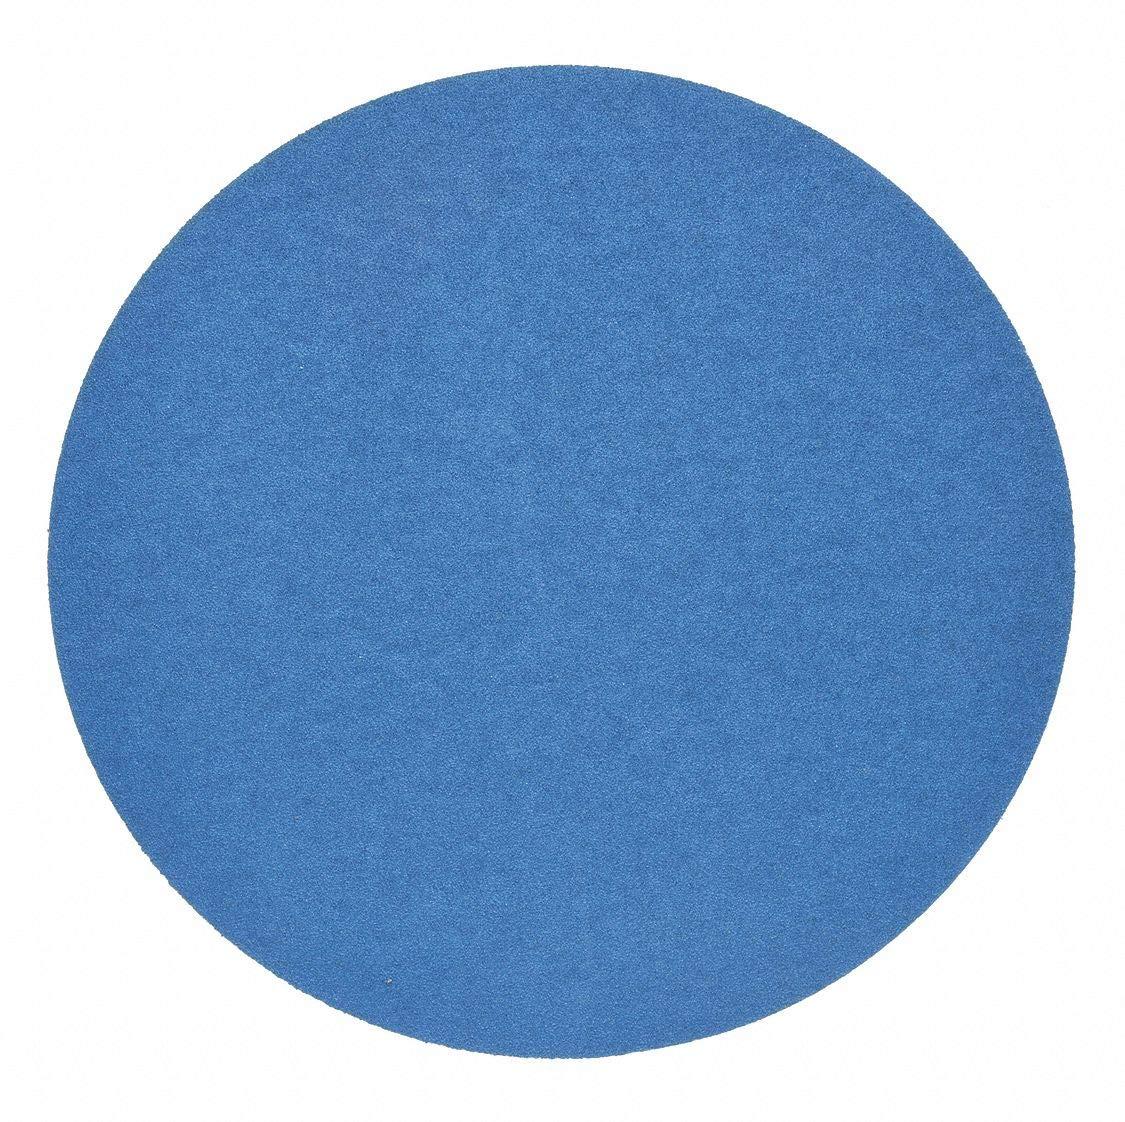 PSA Sanding Disc ZircAlO Cloth SALENEW very popular! 20in 80G Max 47% OFF